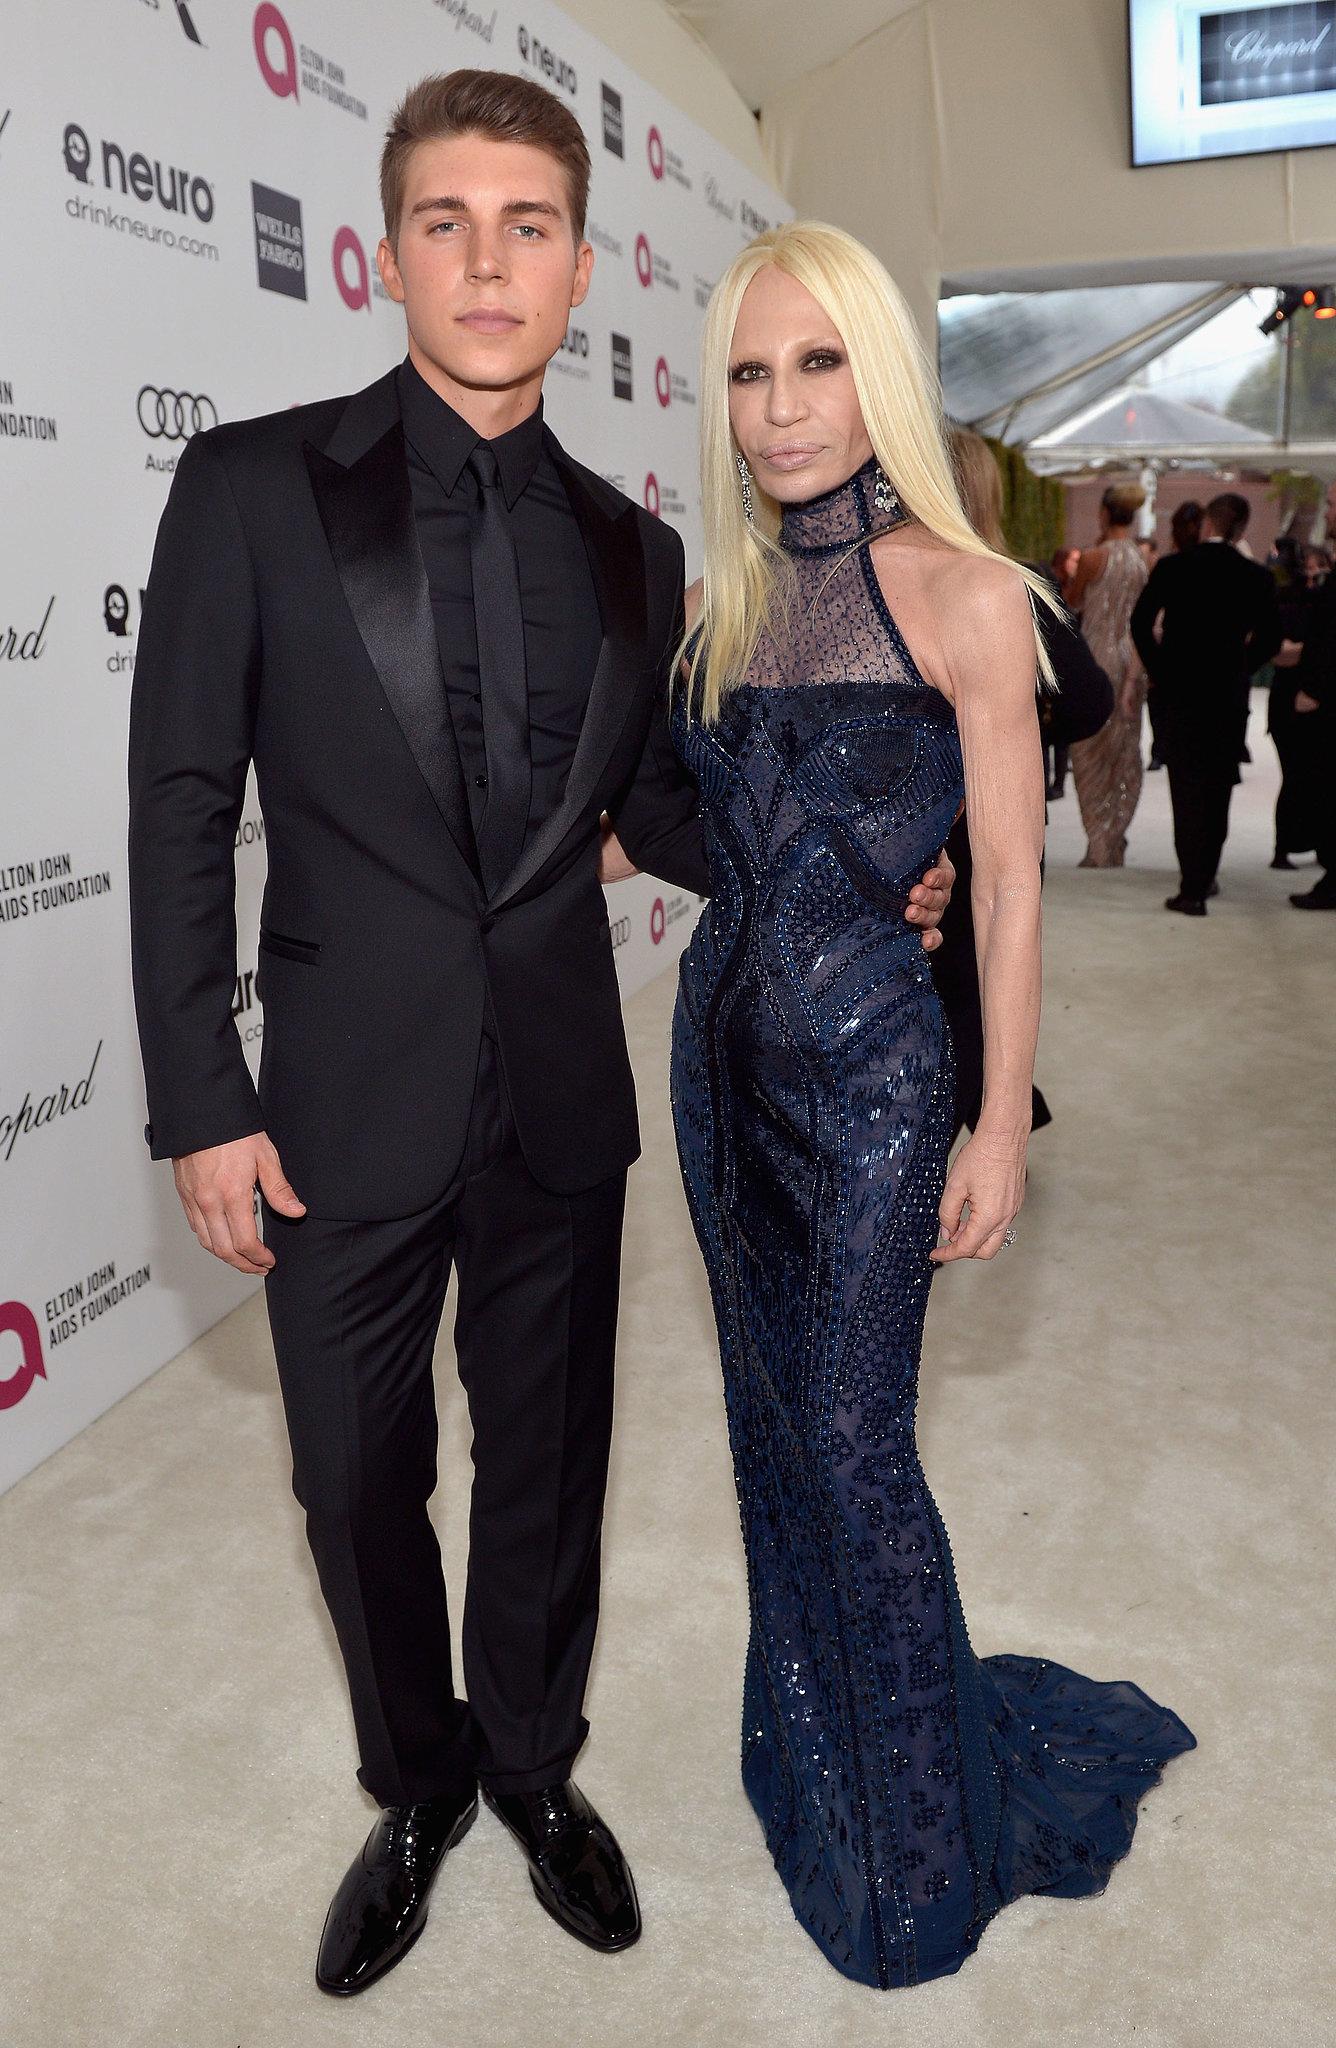 Donatella Versace wore a blue body-conscious gown when she posed with    Donatella Versace Boyfriend